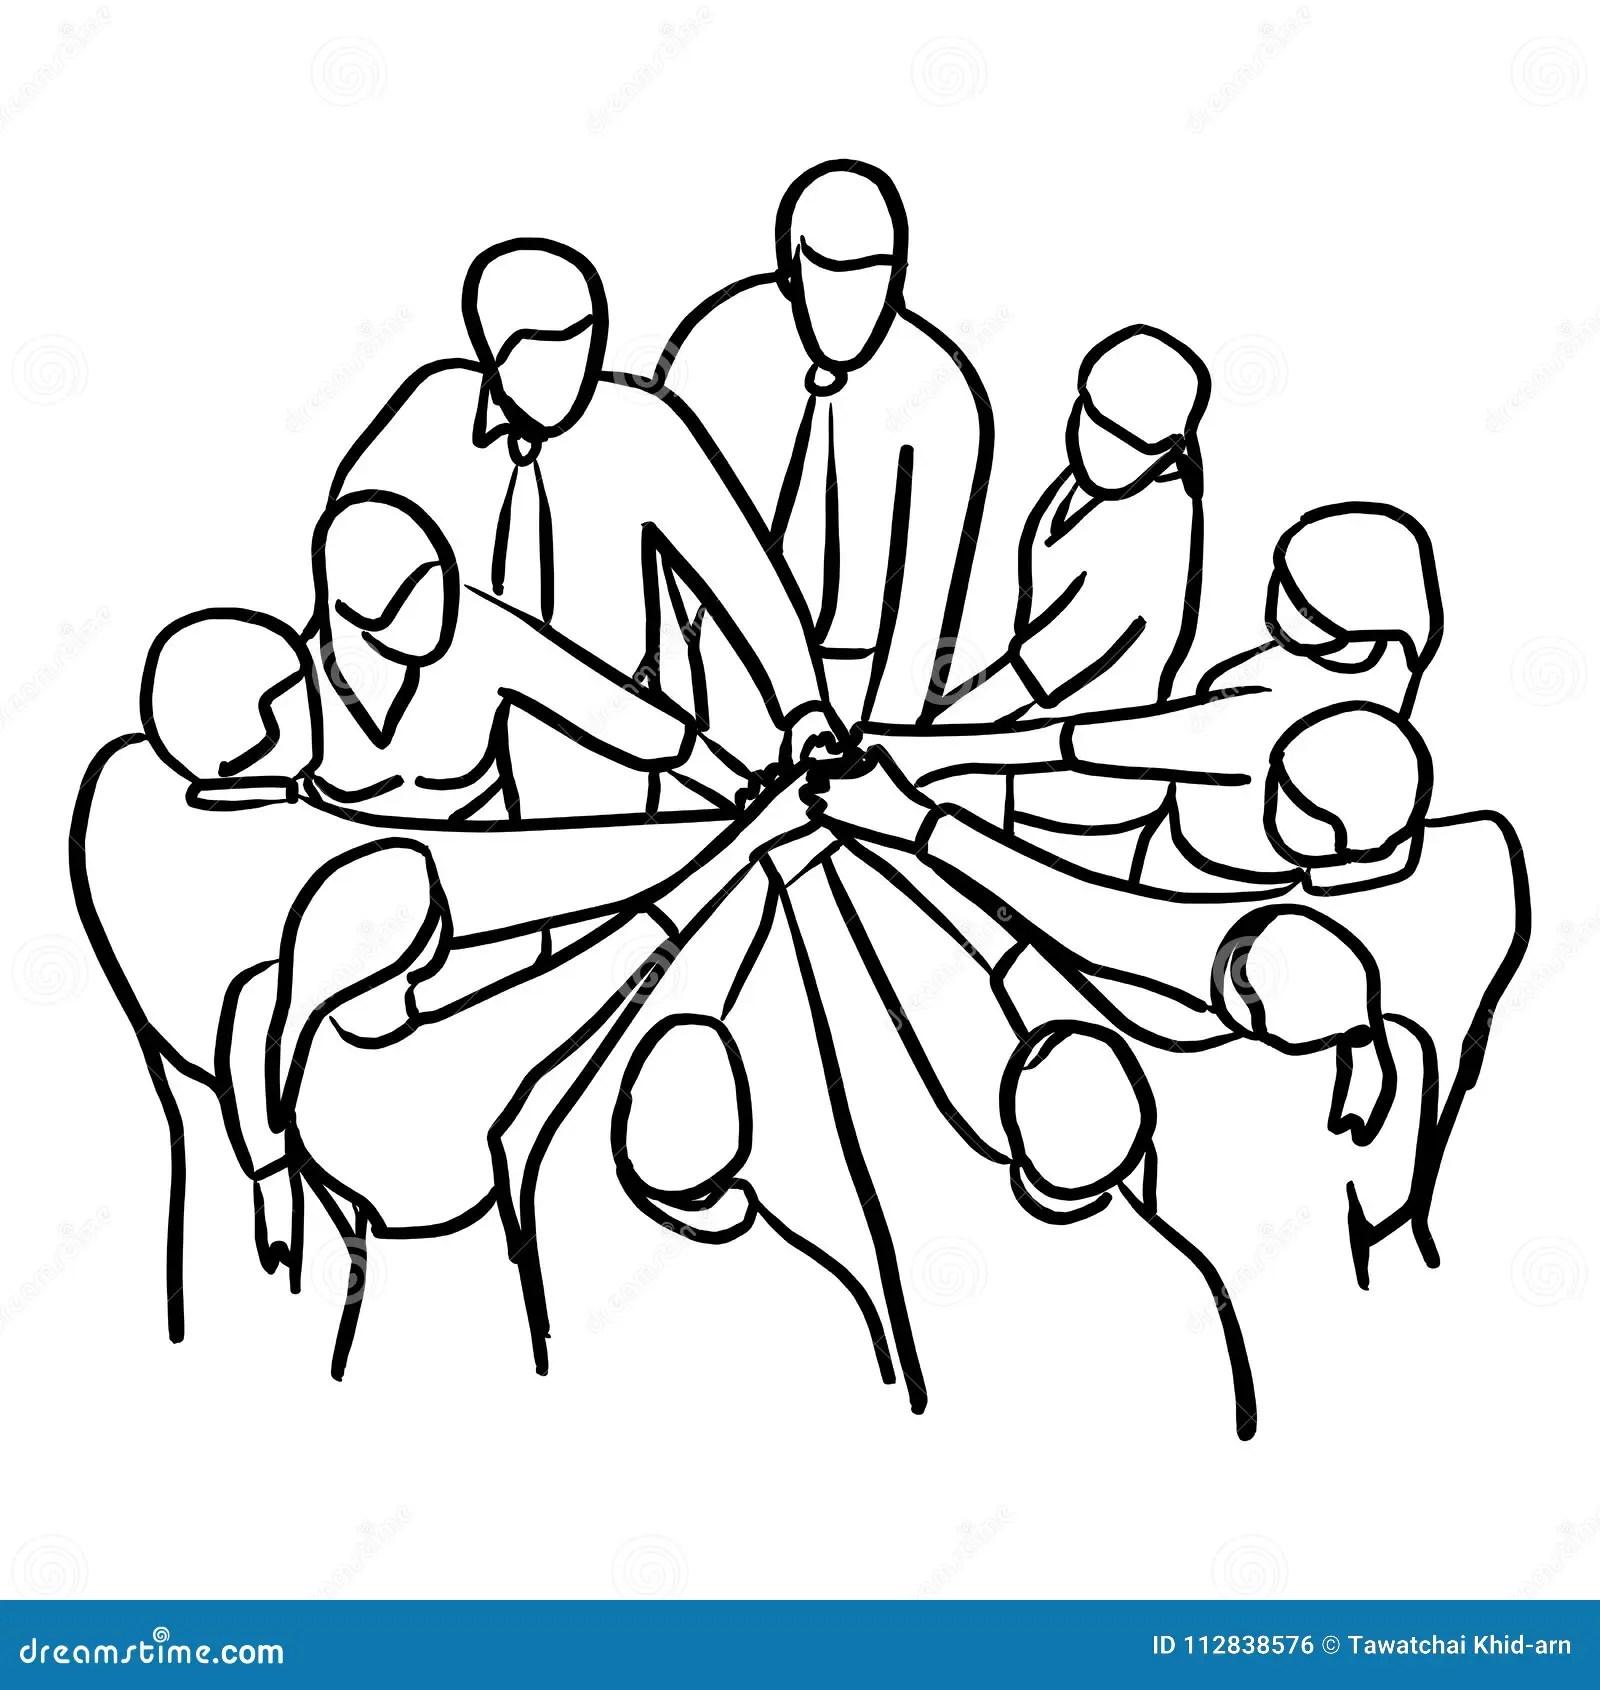 Business People Teamwork Join Hands Vector Illustration